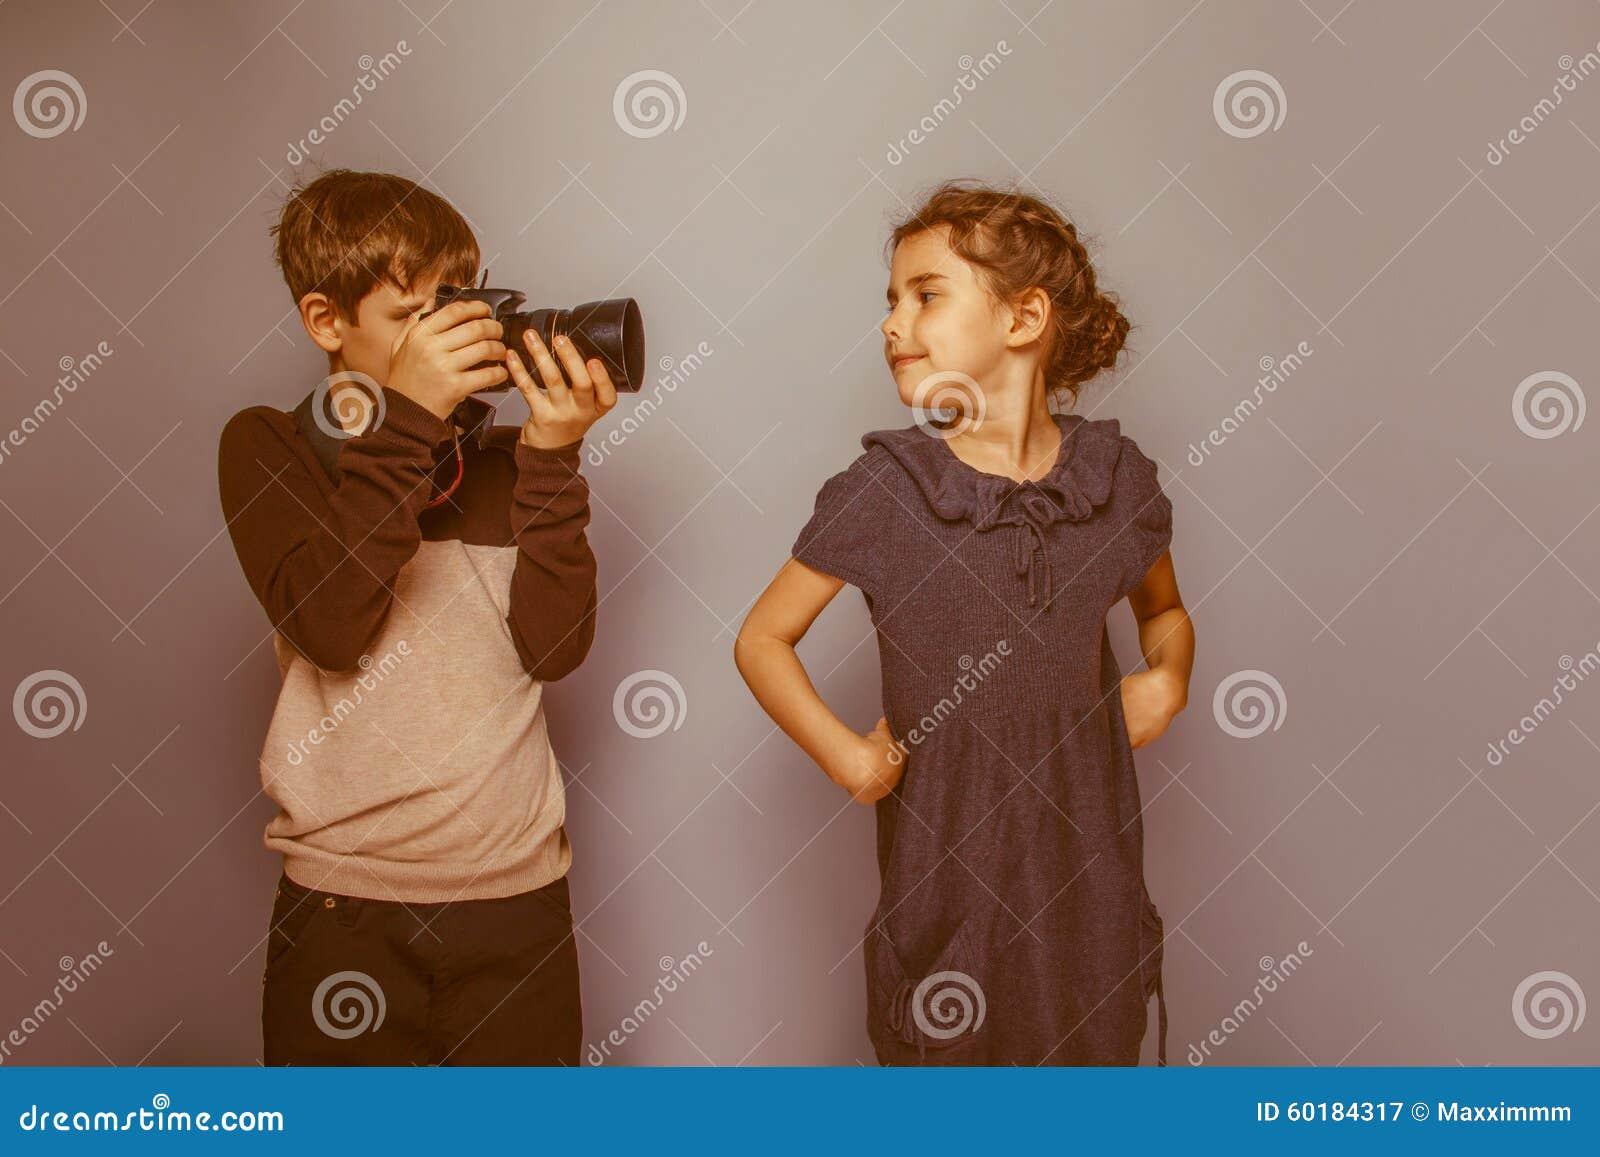 boy teenager european appearance photographs stock image image of